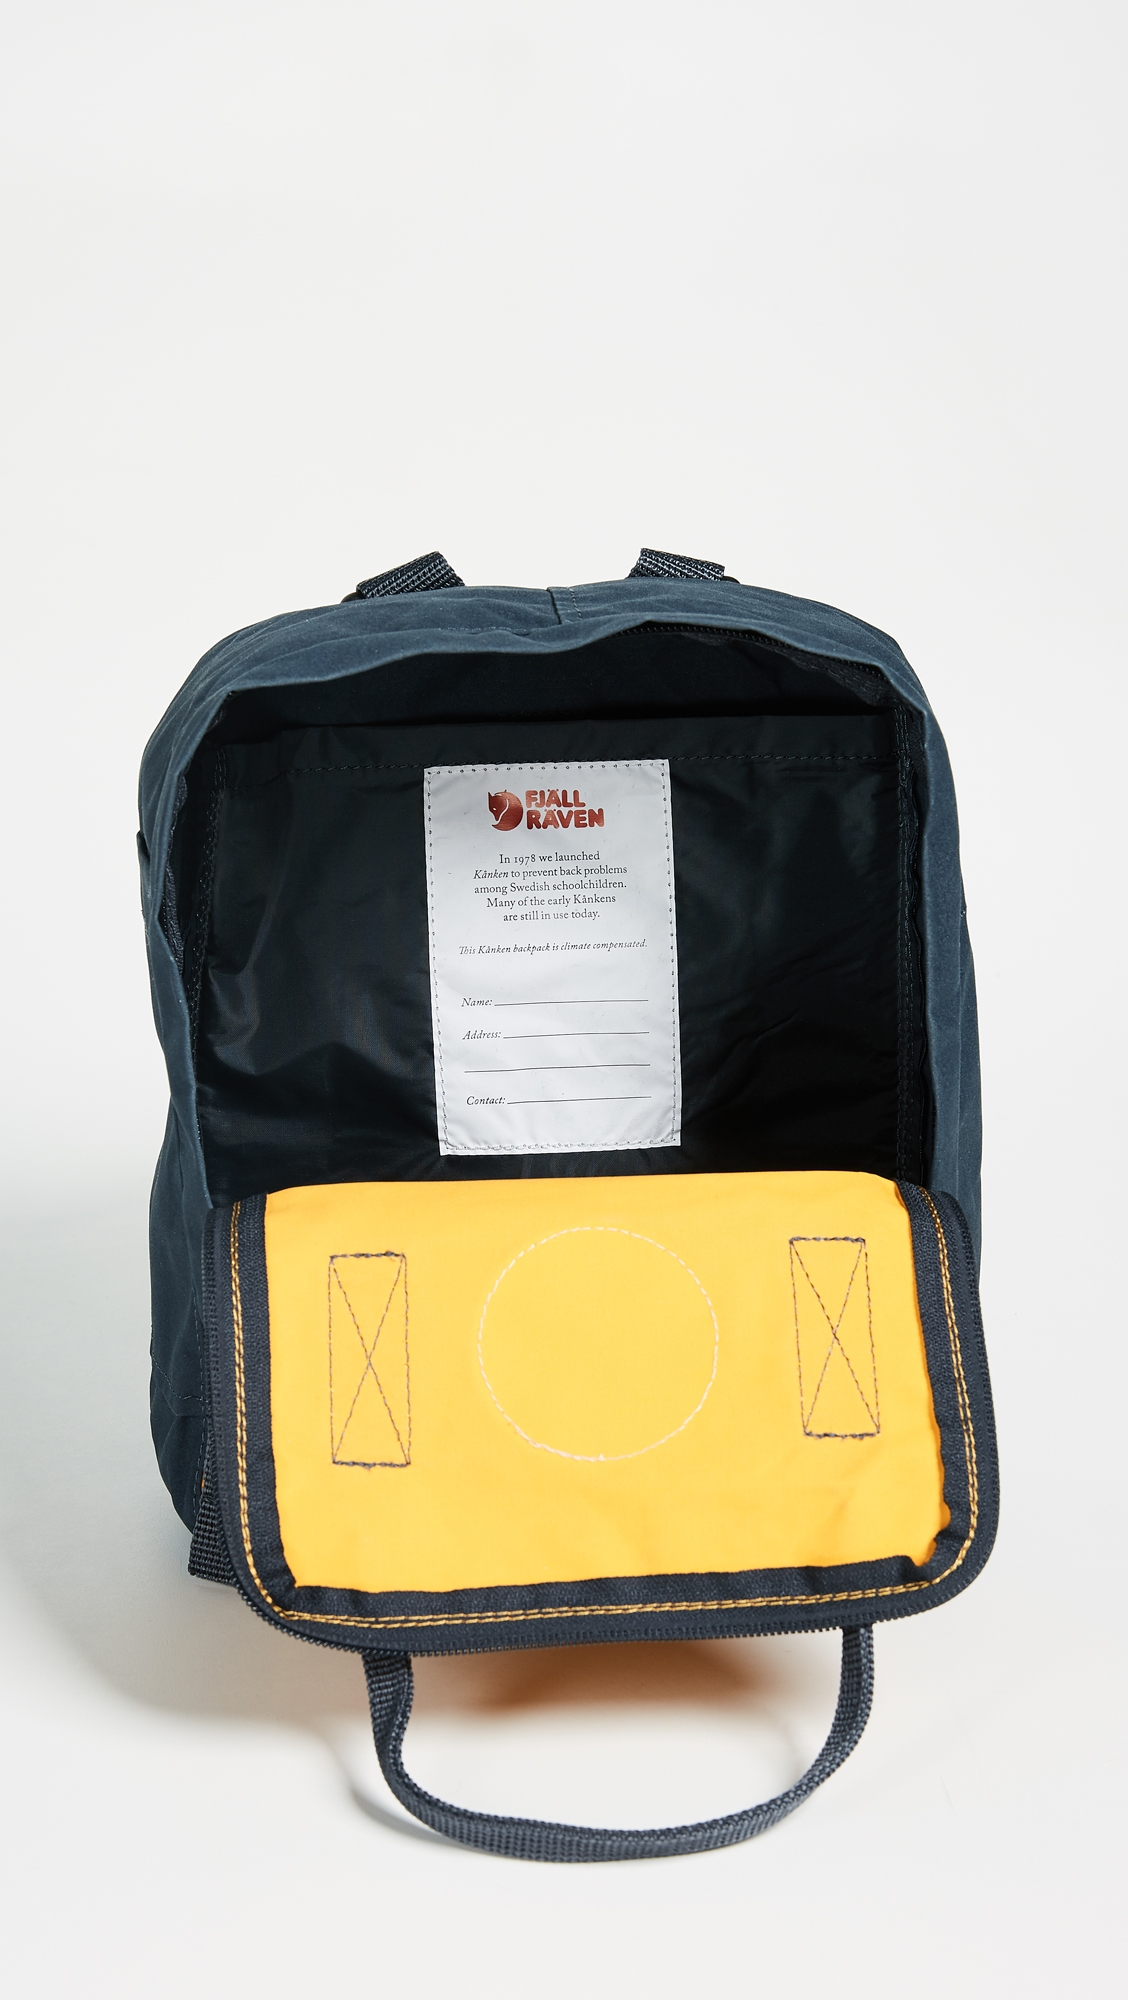 Мини-рюкзак Kanken Fjallraven  (FJALL3006174433314)